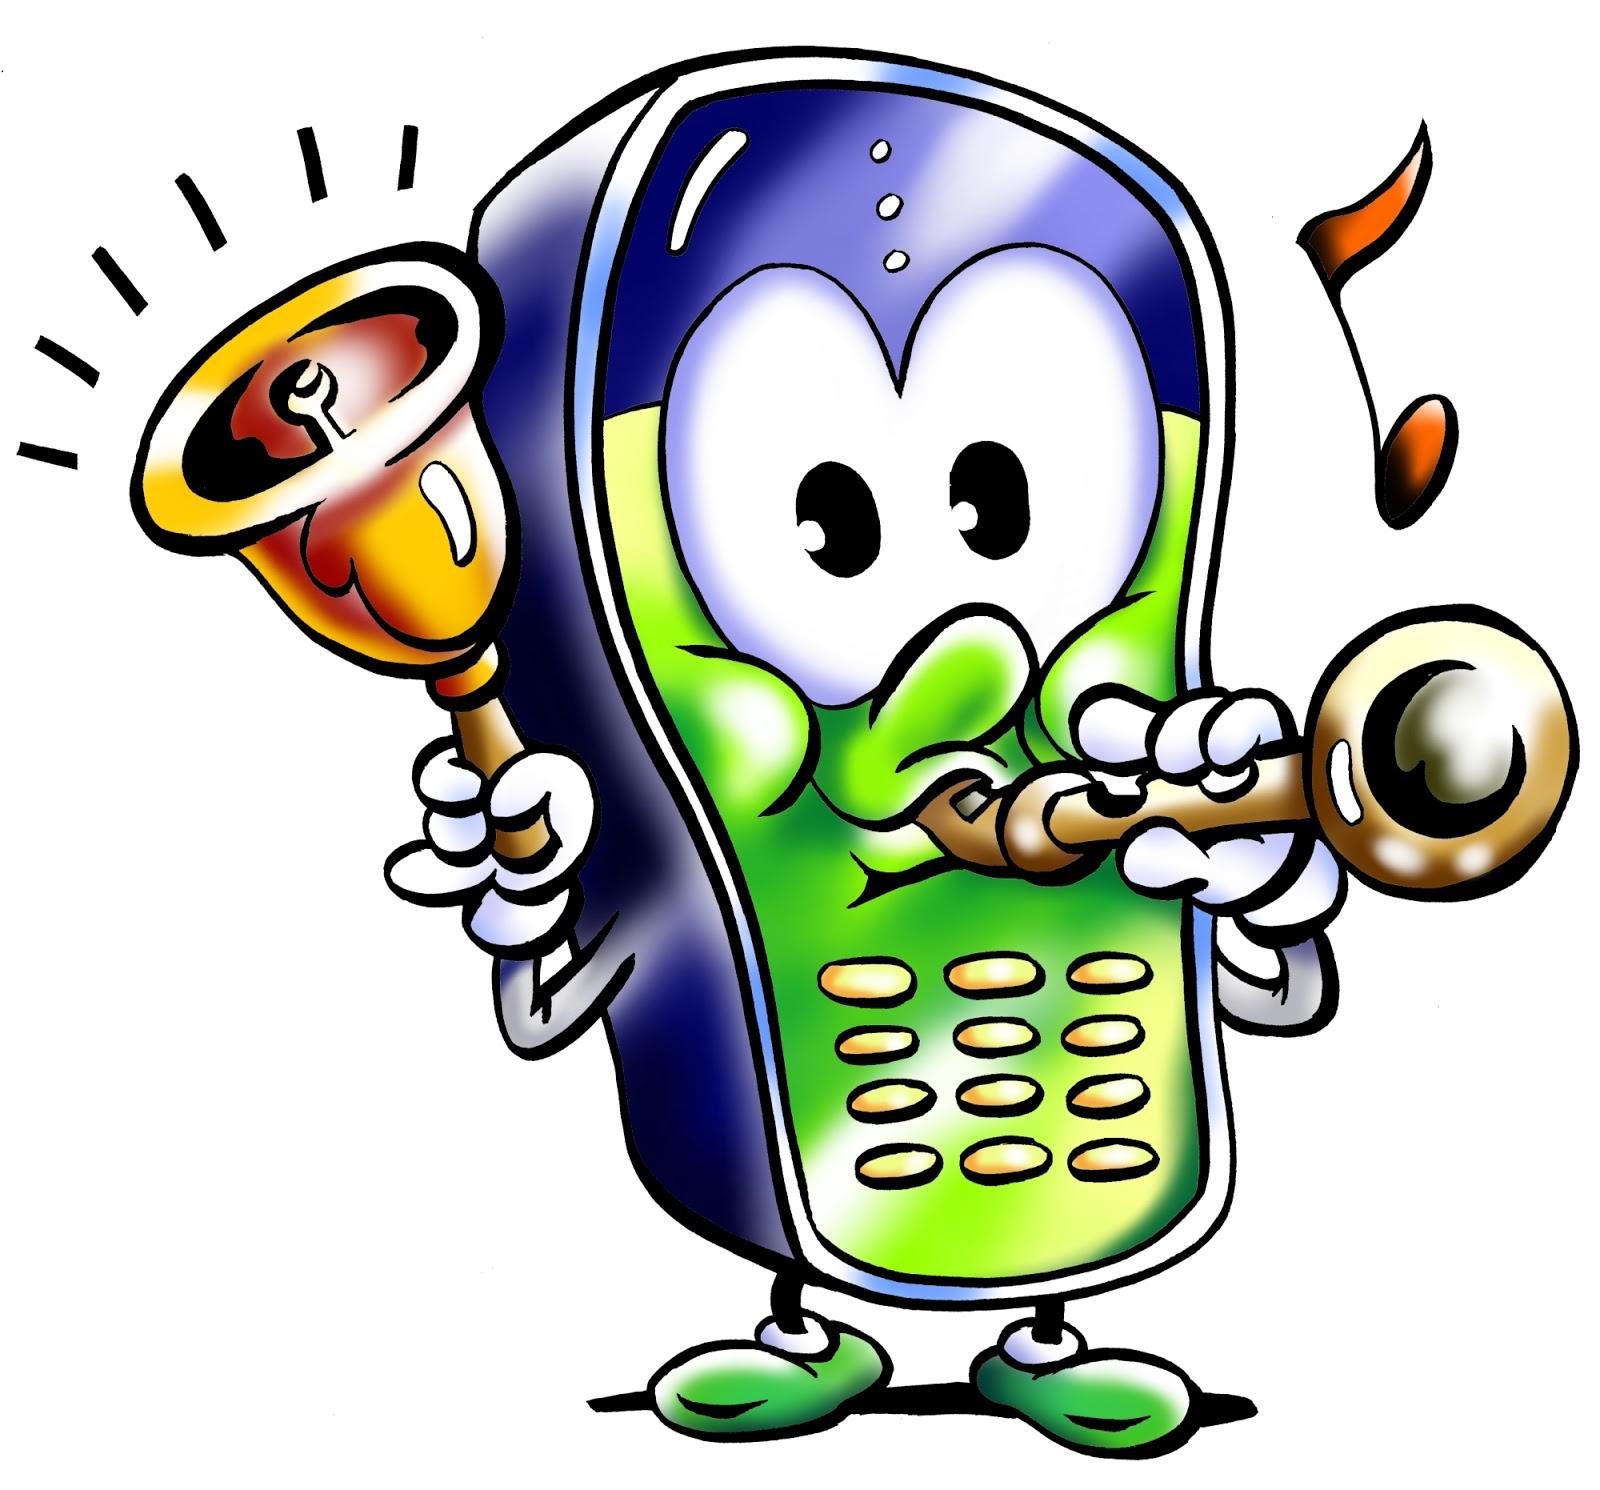 clip art of phone ringing - photo #27